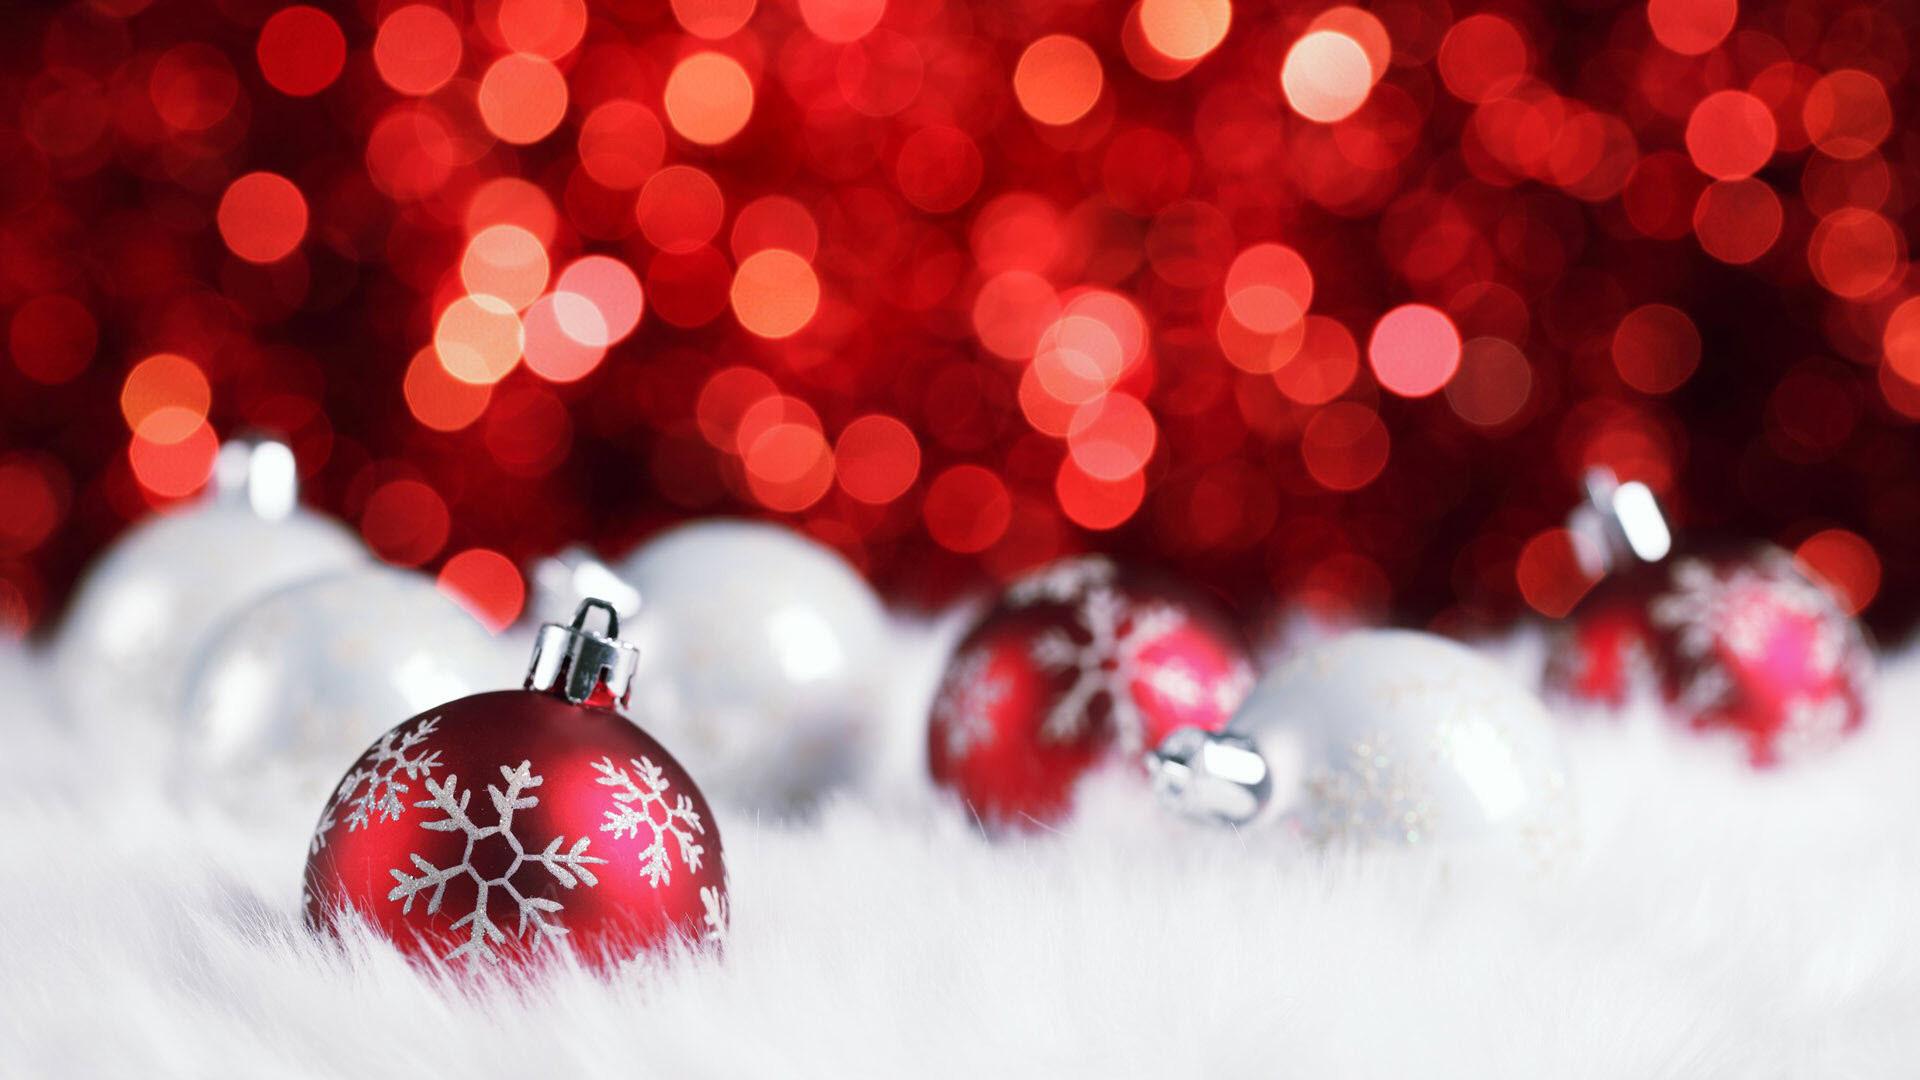 Christmas Desktop Backgrounds 62 Pictures